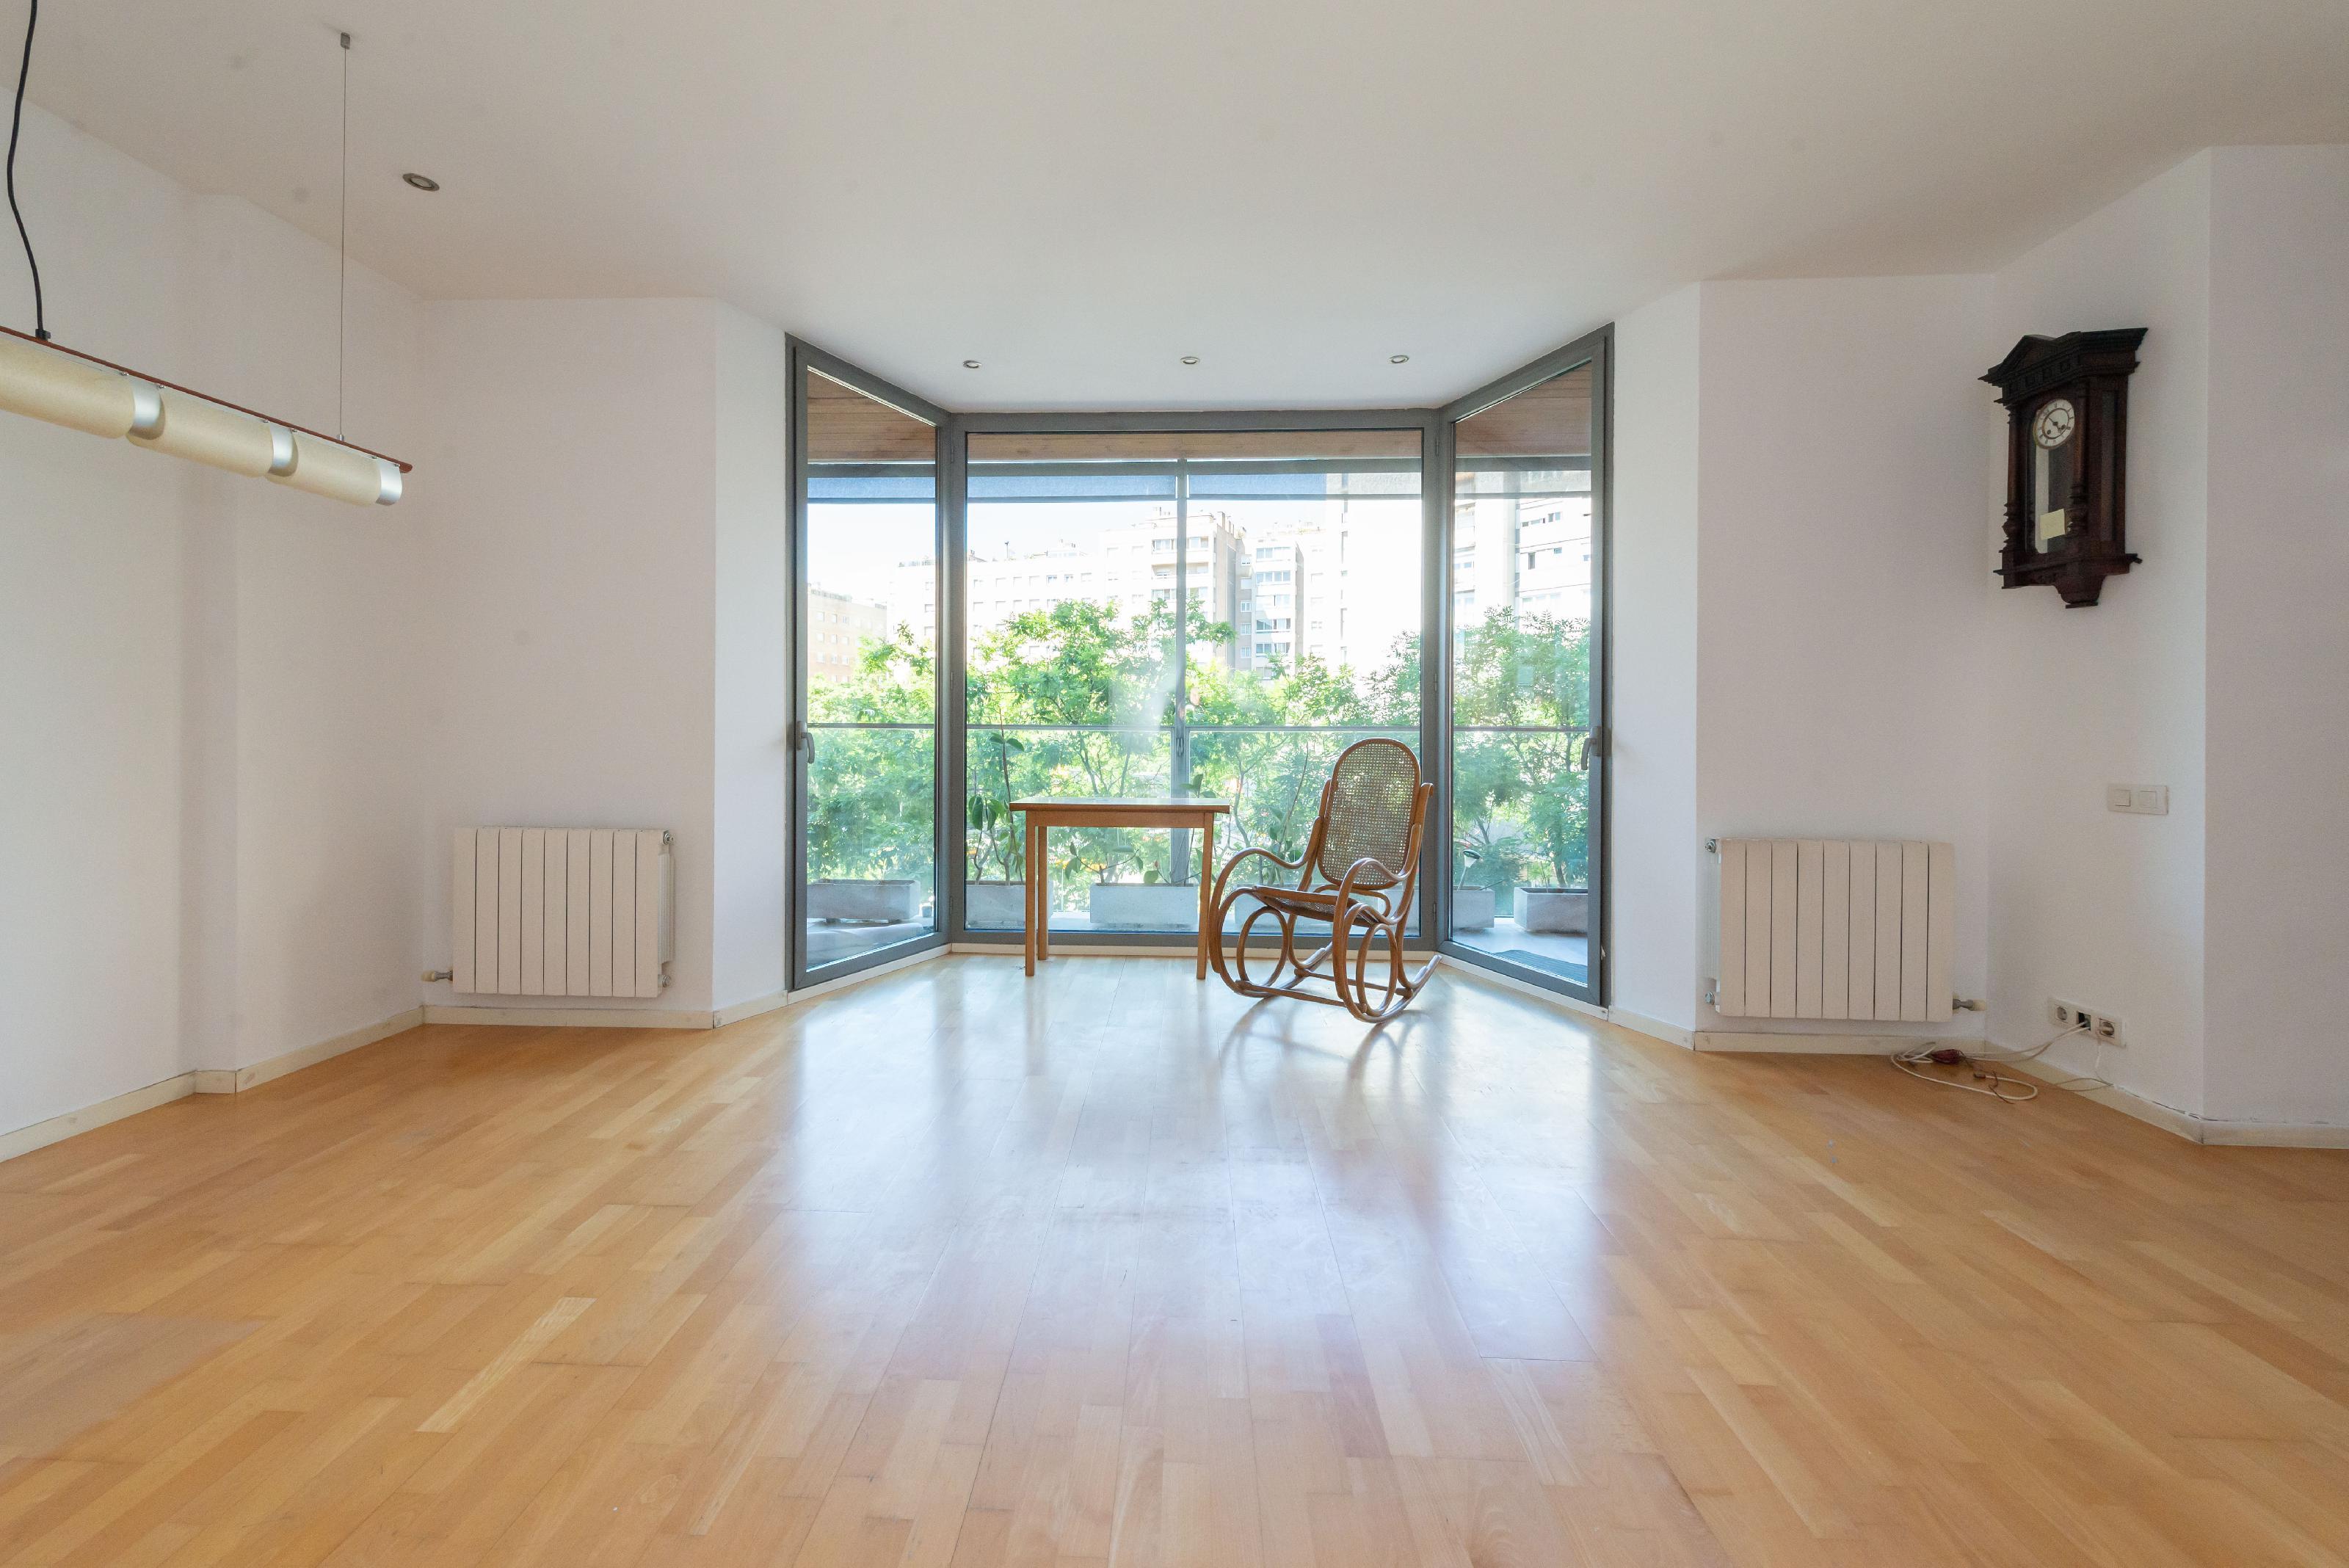 251446 Flat for sale in Sarrià-Sant Gervasi, Tres Torres 3